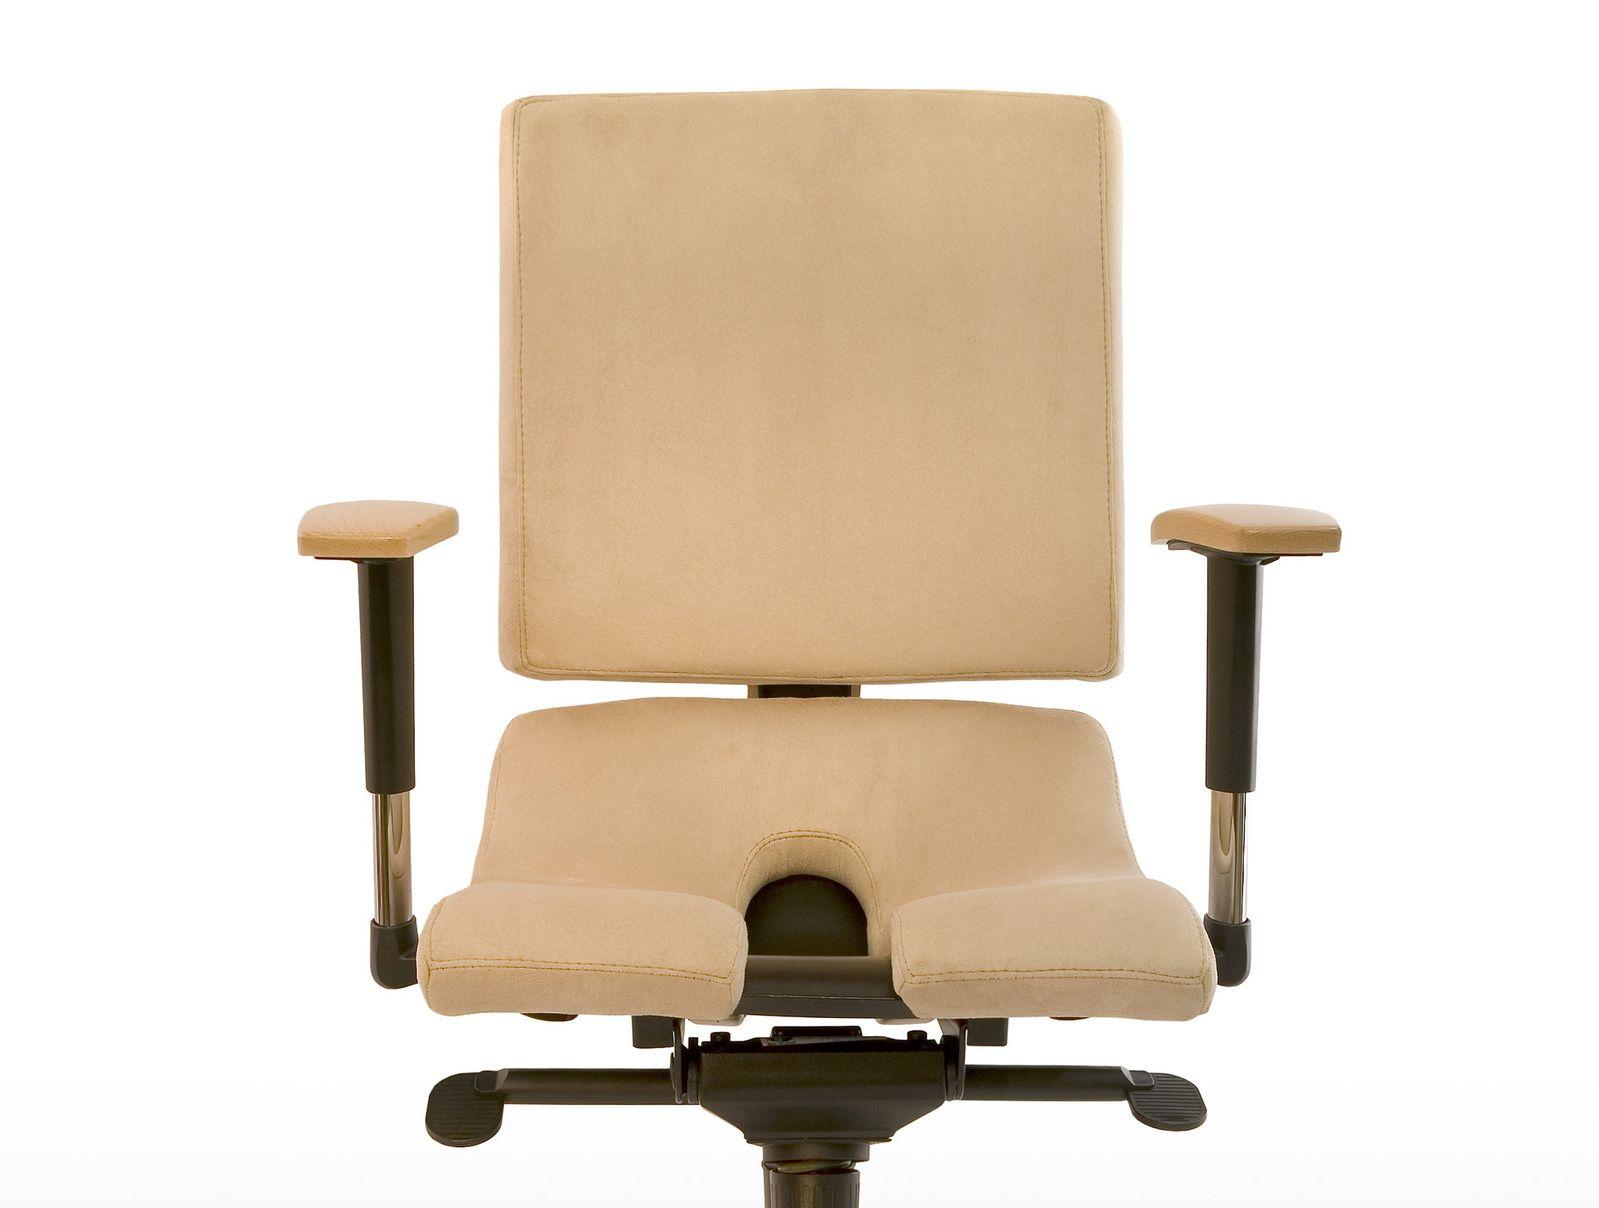 Bürostuhl ergonomisch einstellen  Bürostuhl ergonomisch einstellen: So geht's - Servervoice